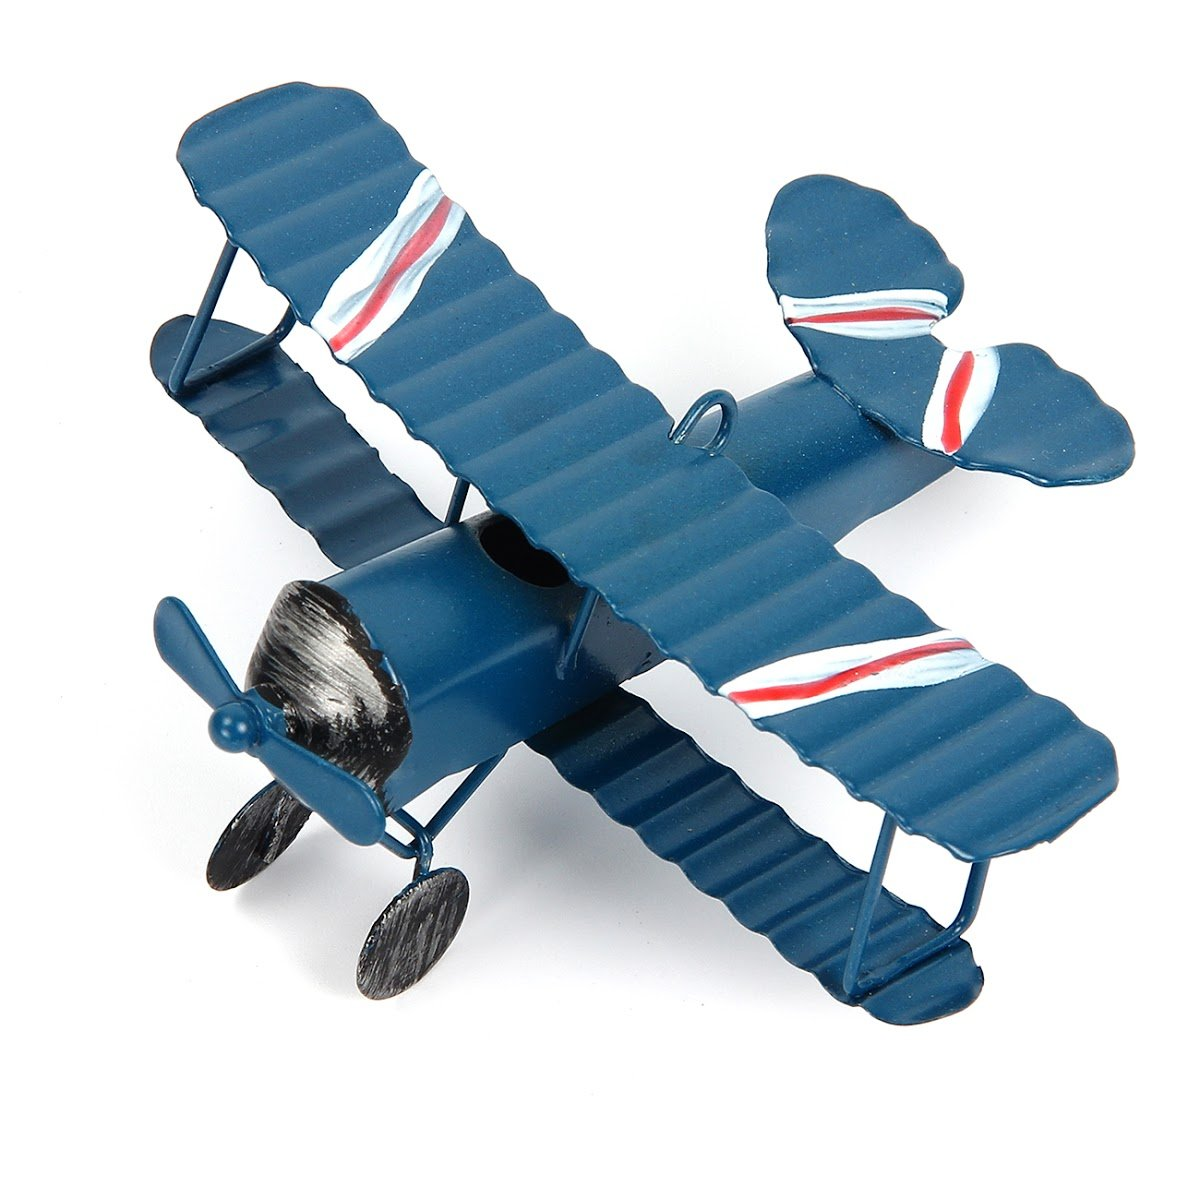 Evilatat Vintage Flugzeug Modell Eisenmodell Metall Flugzeug-Dekoration Doppeldecker Flugzeug Miniatur Dekoration Sammlung Büro Ornament Blau Evilandat